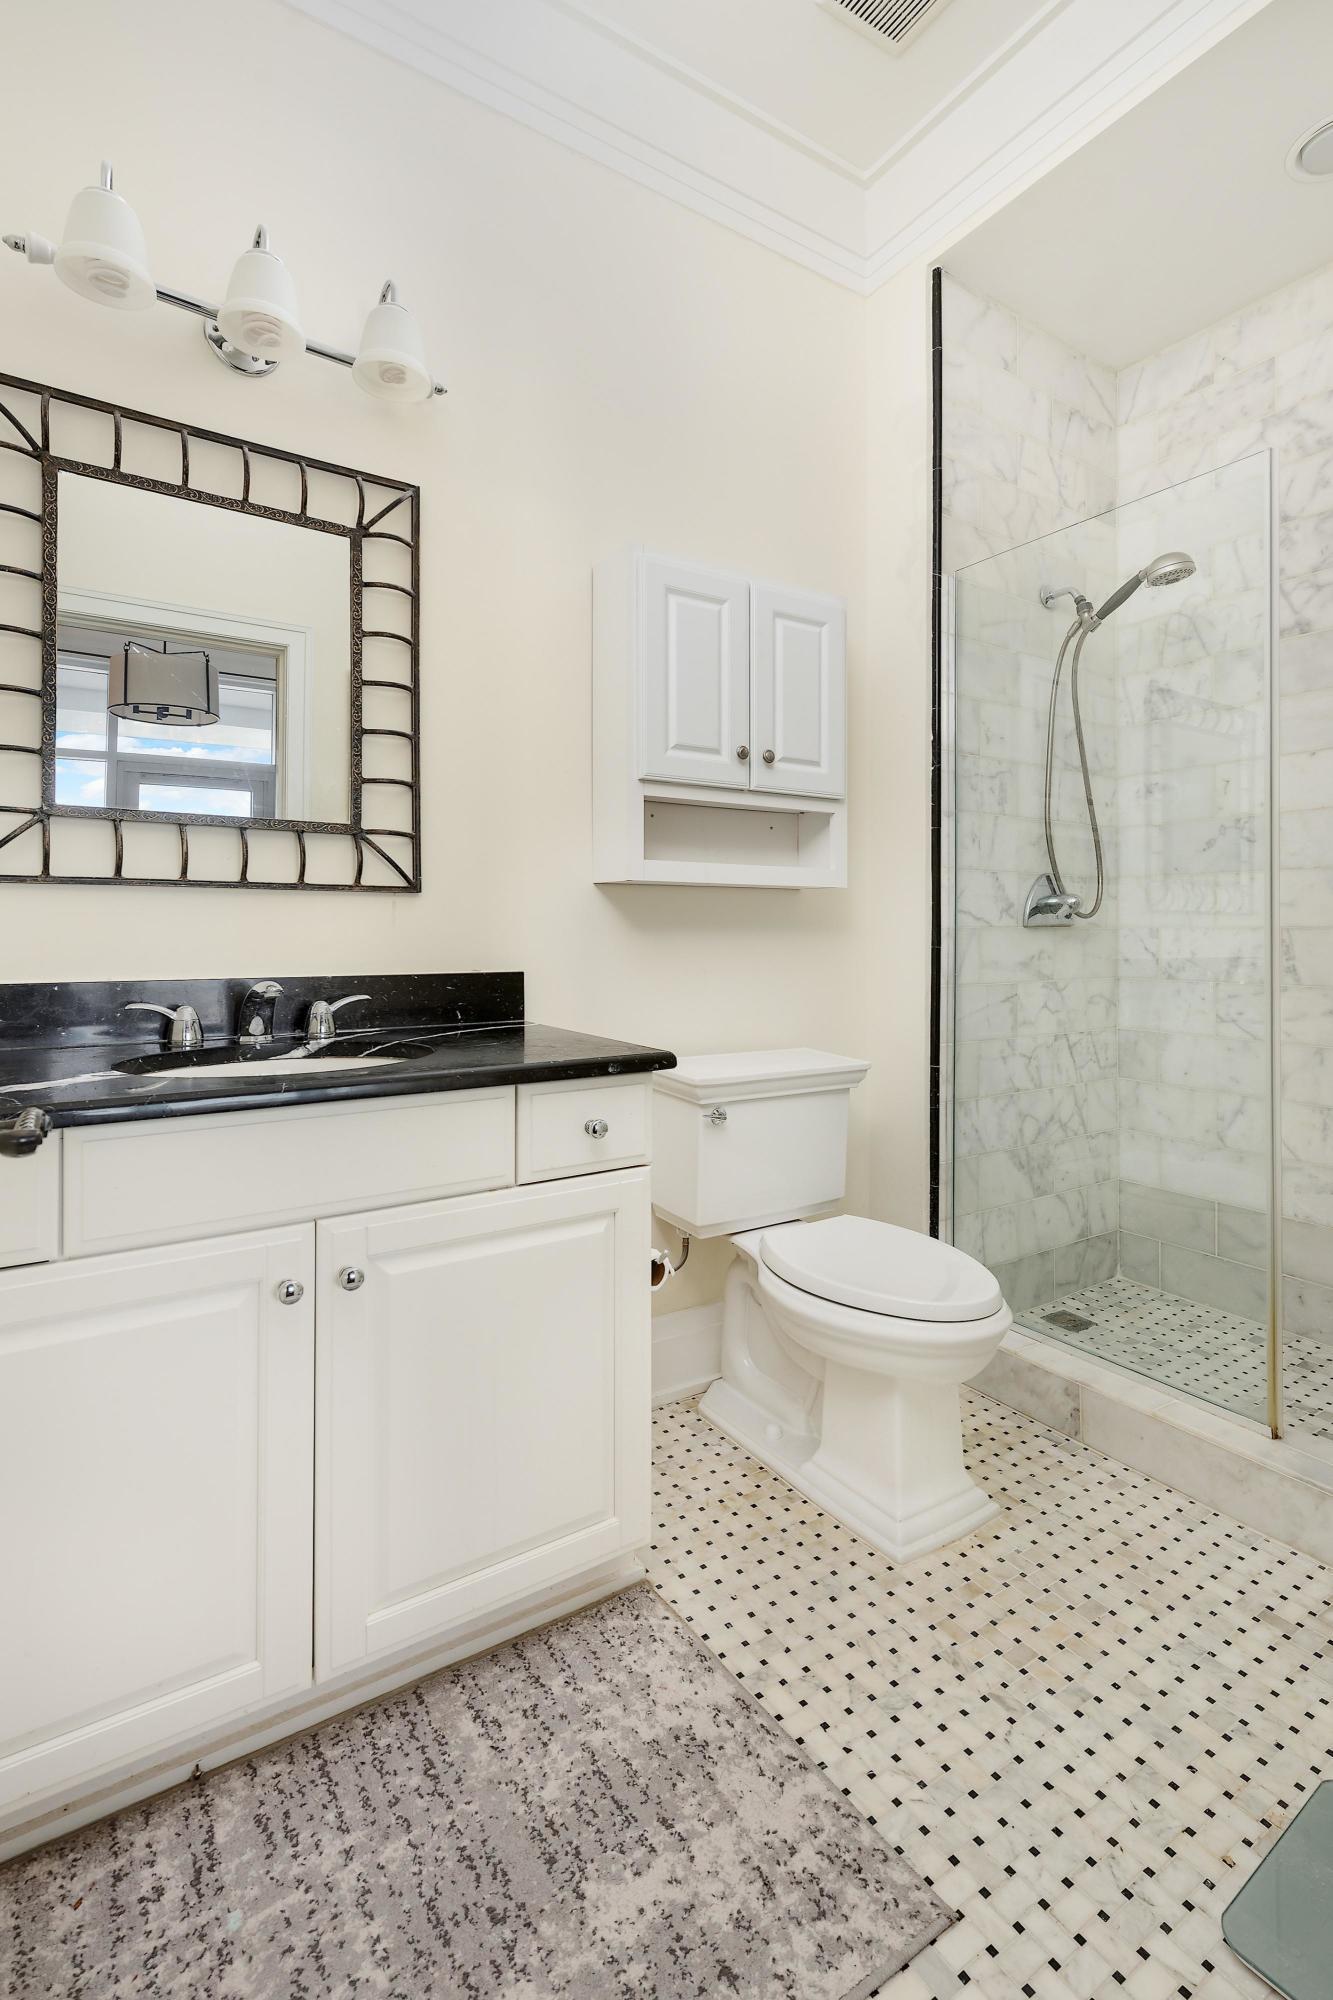 Tides Condominiums Homes For Sale - 363 Cooper River, Mount Pleasant, SC - 12